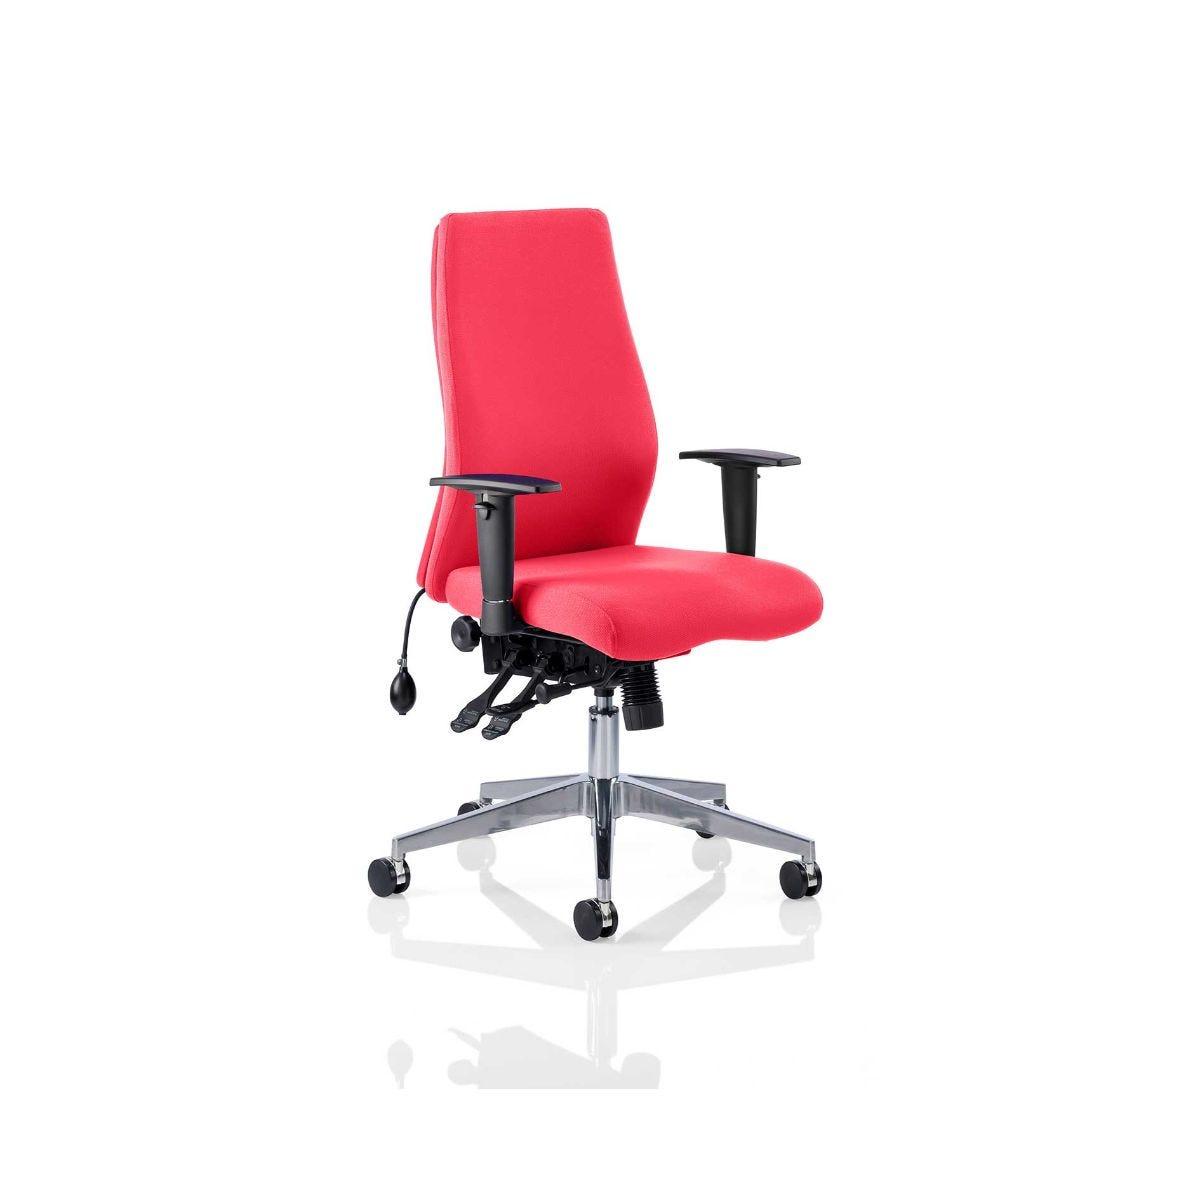 Onyx Bespoke Office Chair, Cherry